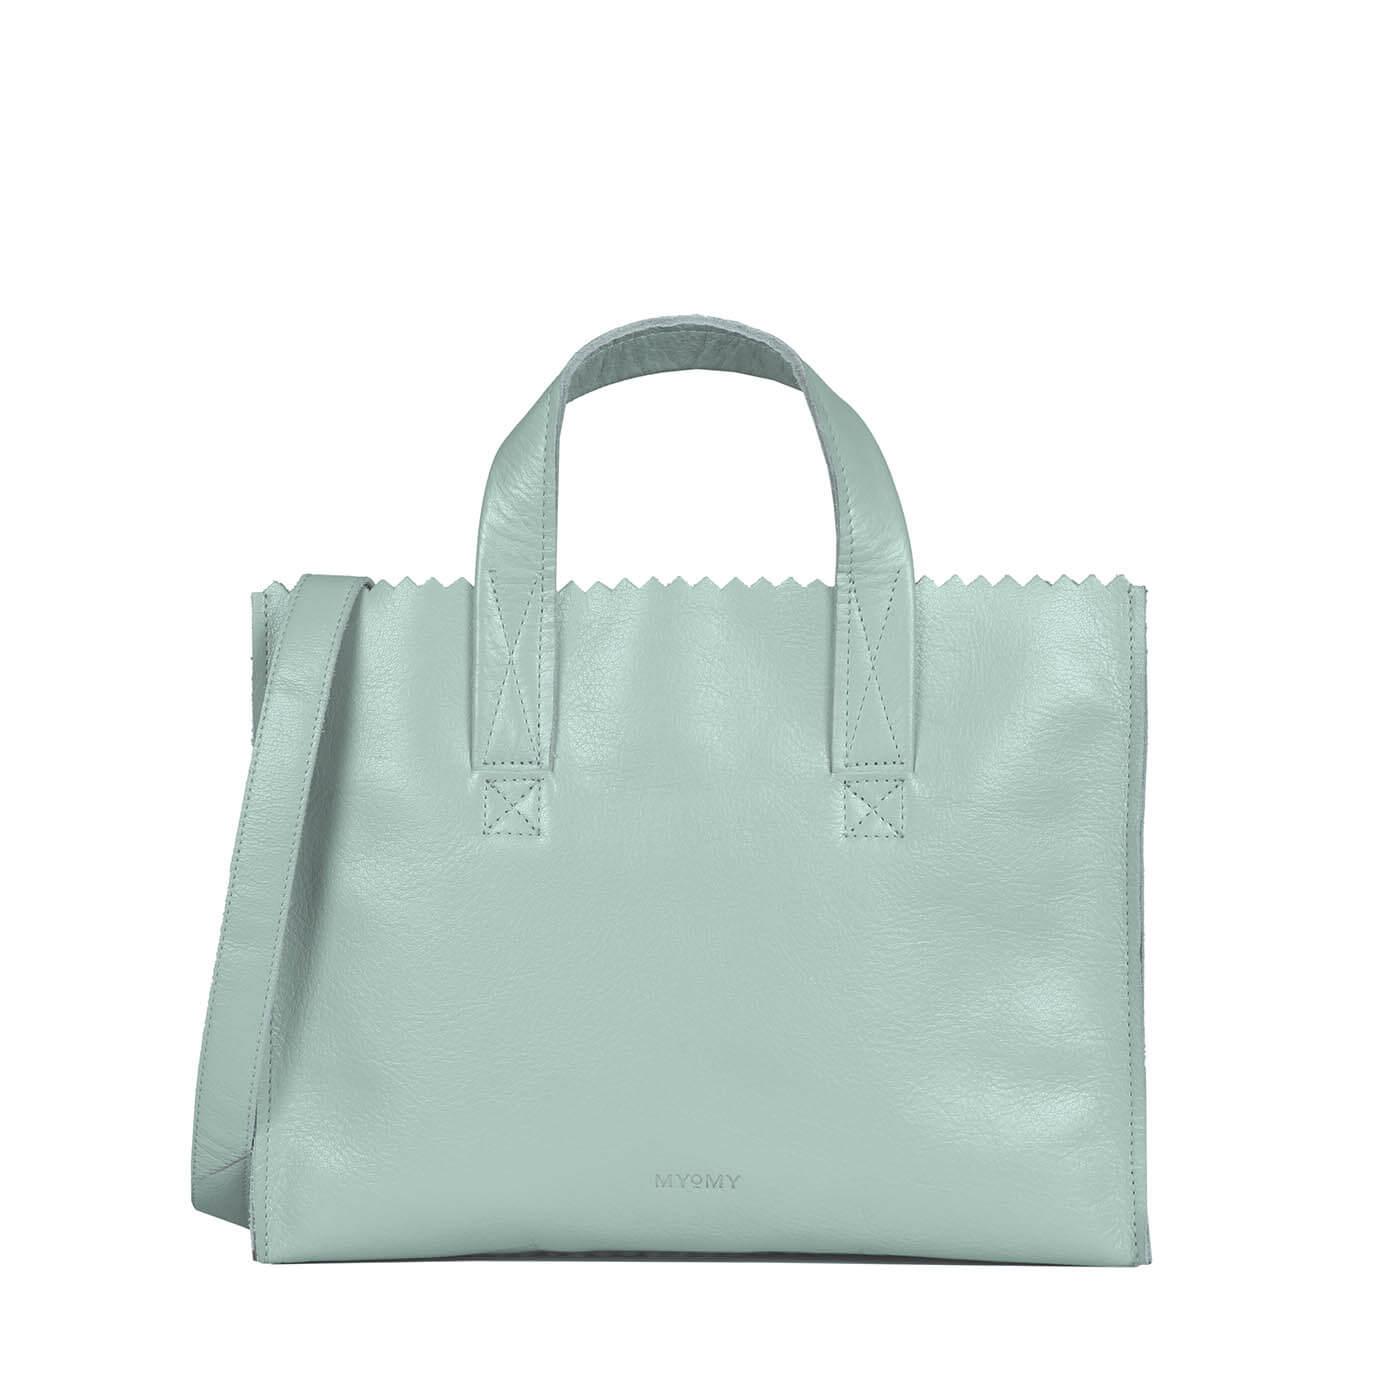 MY PAPER BAG Handbag cross-body - seville mint